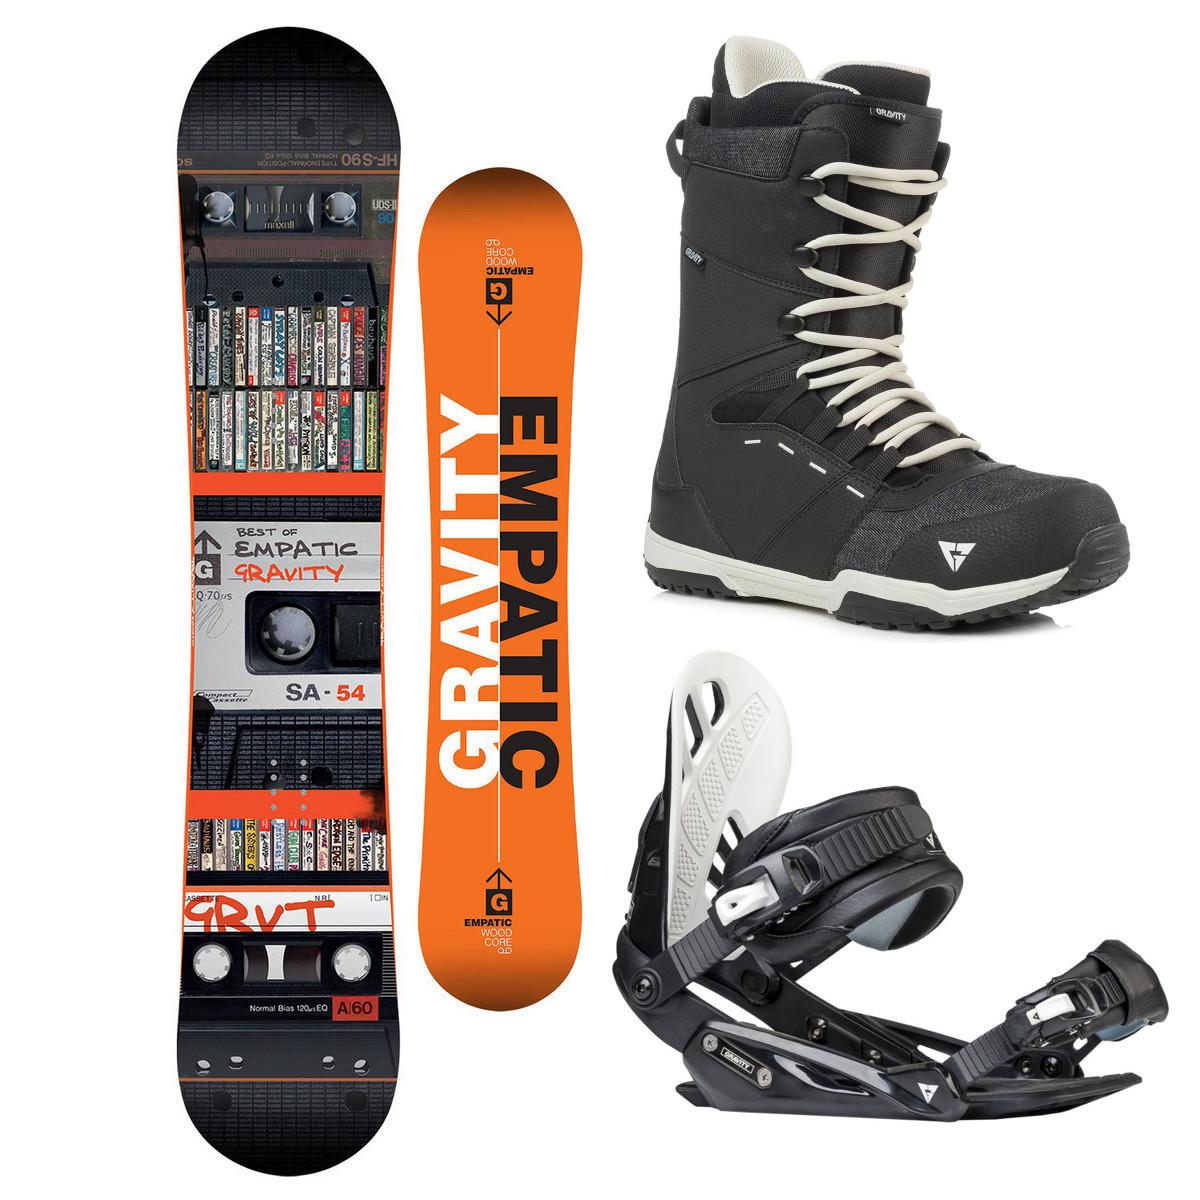 Snowboardový komplet Gravity Empatic 17/18 L (EU 42-48) 154